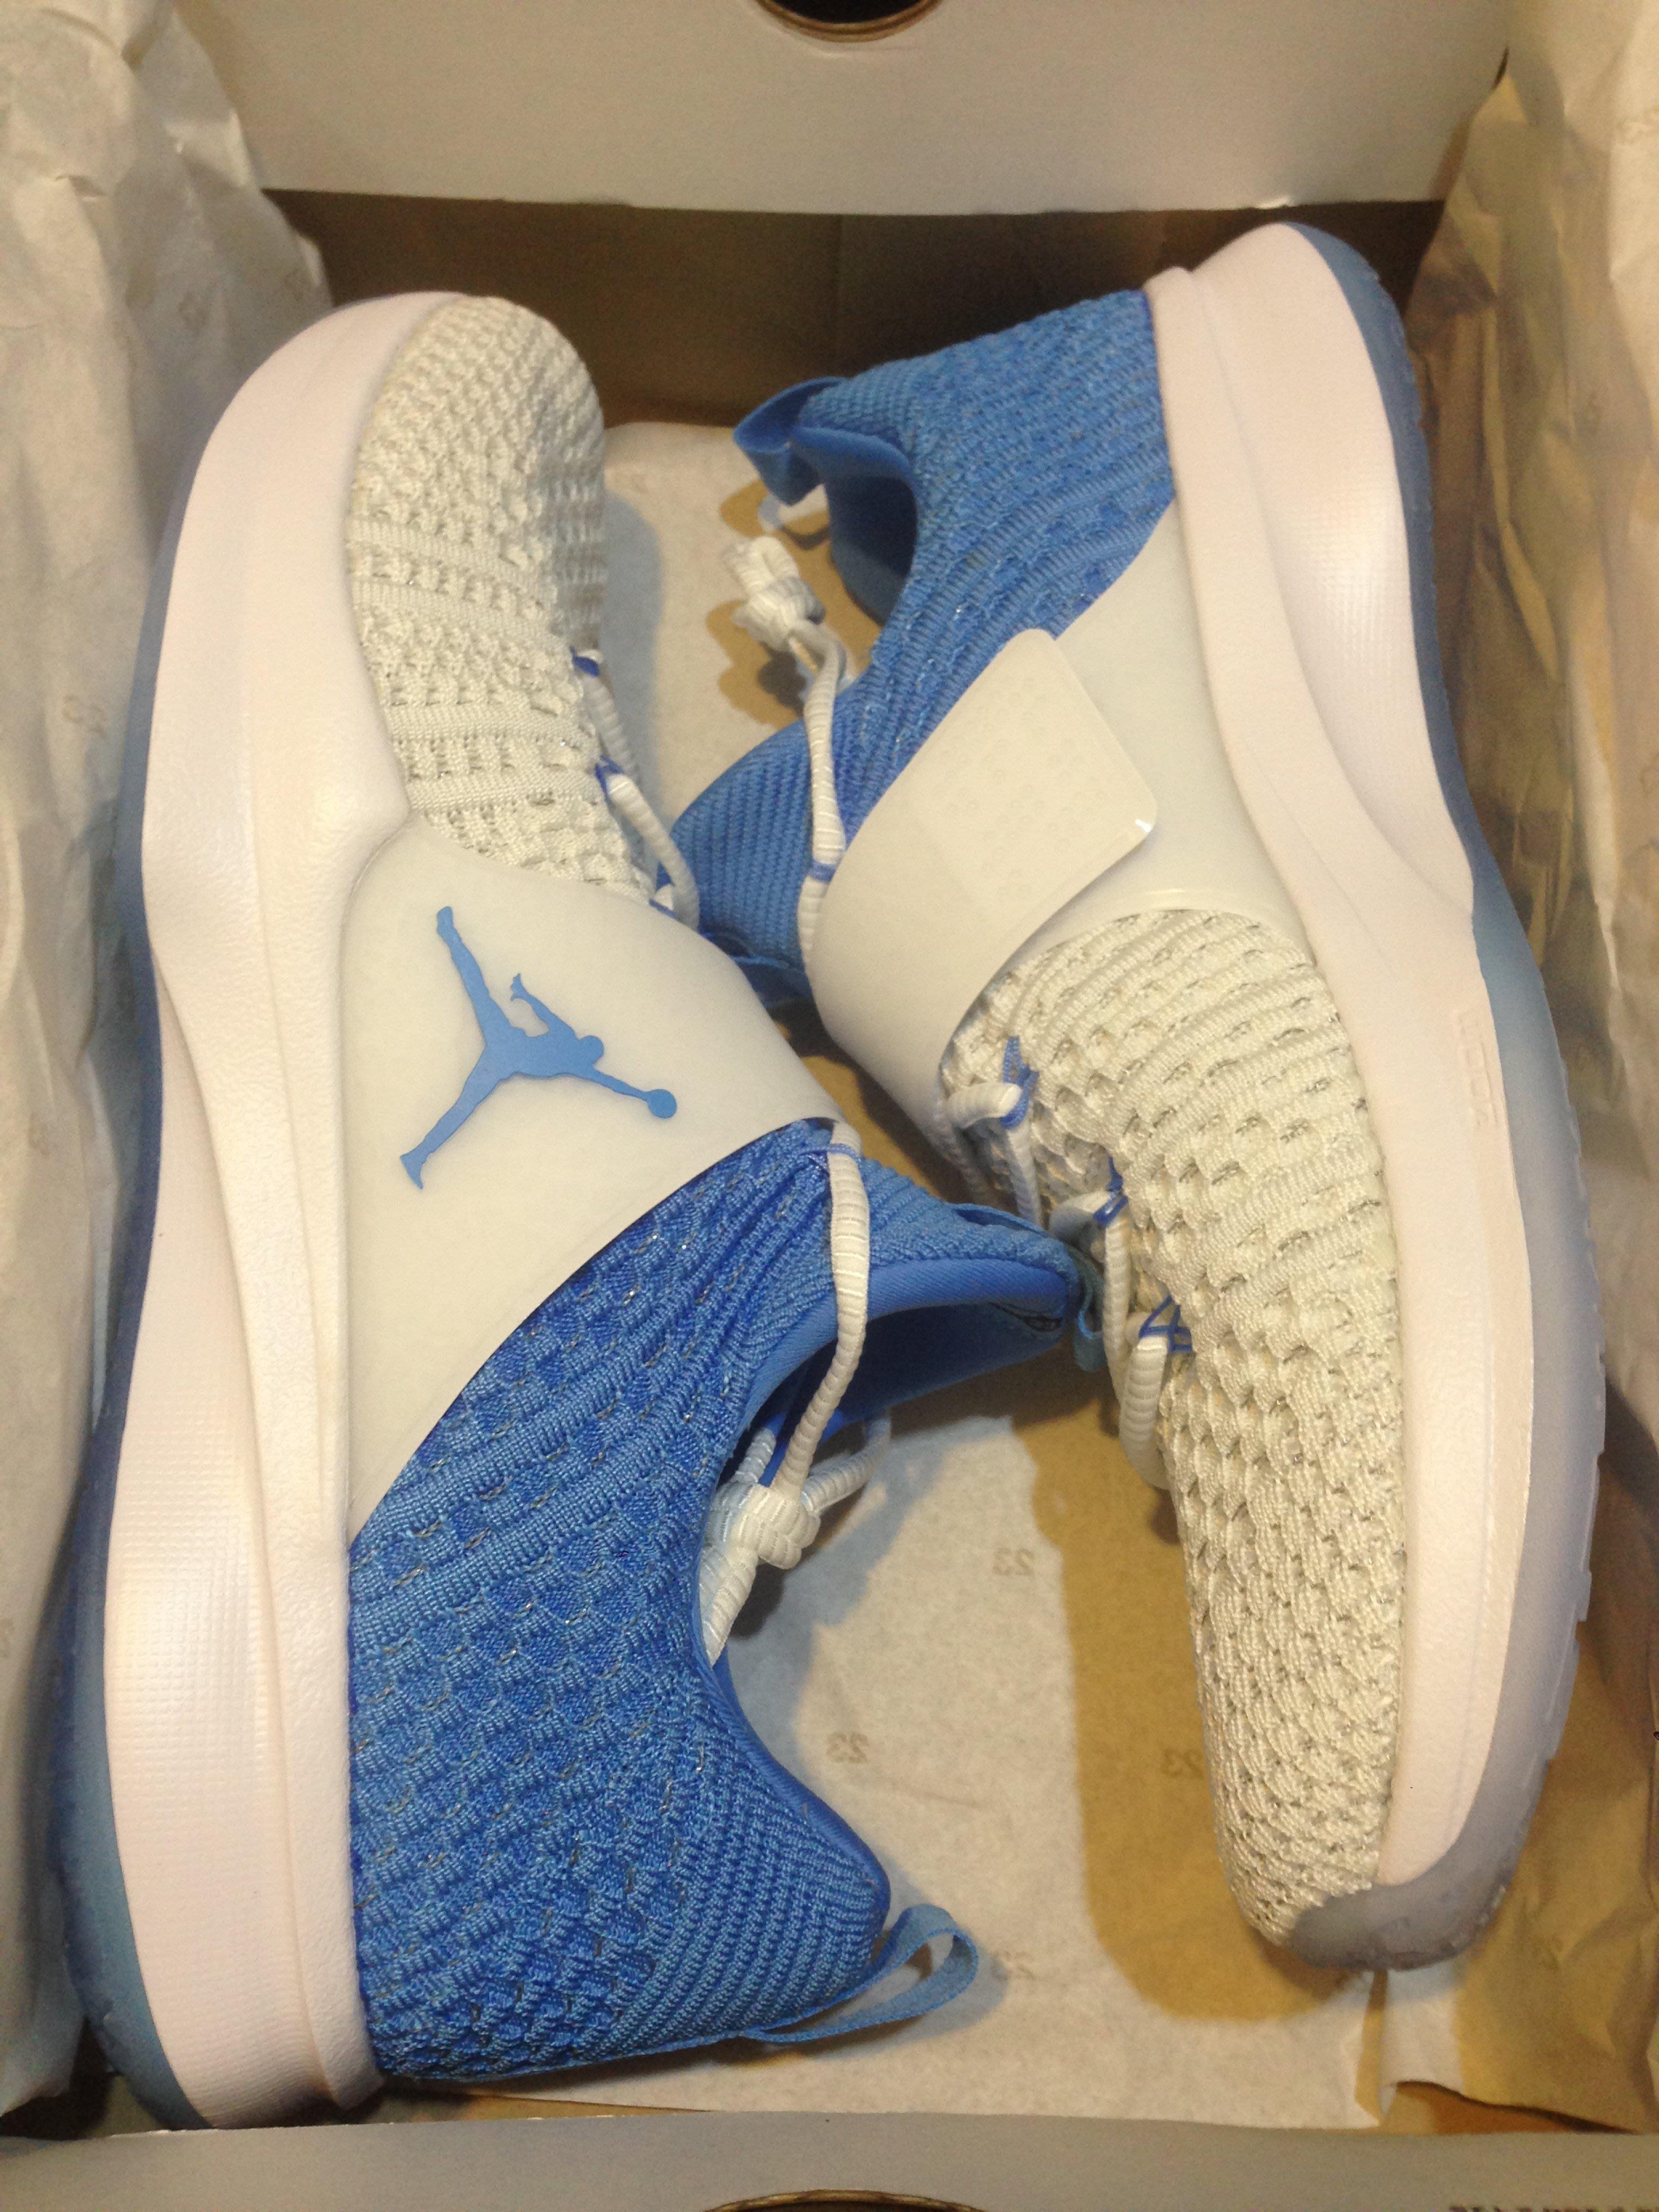 預購 NIKE Air Jordan Trainer 2 Flyknit 'UNC' 北卡藍訓練鞋